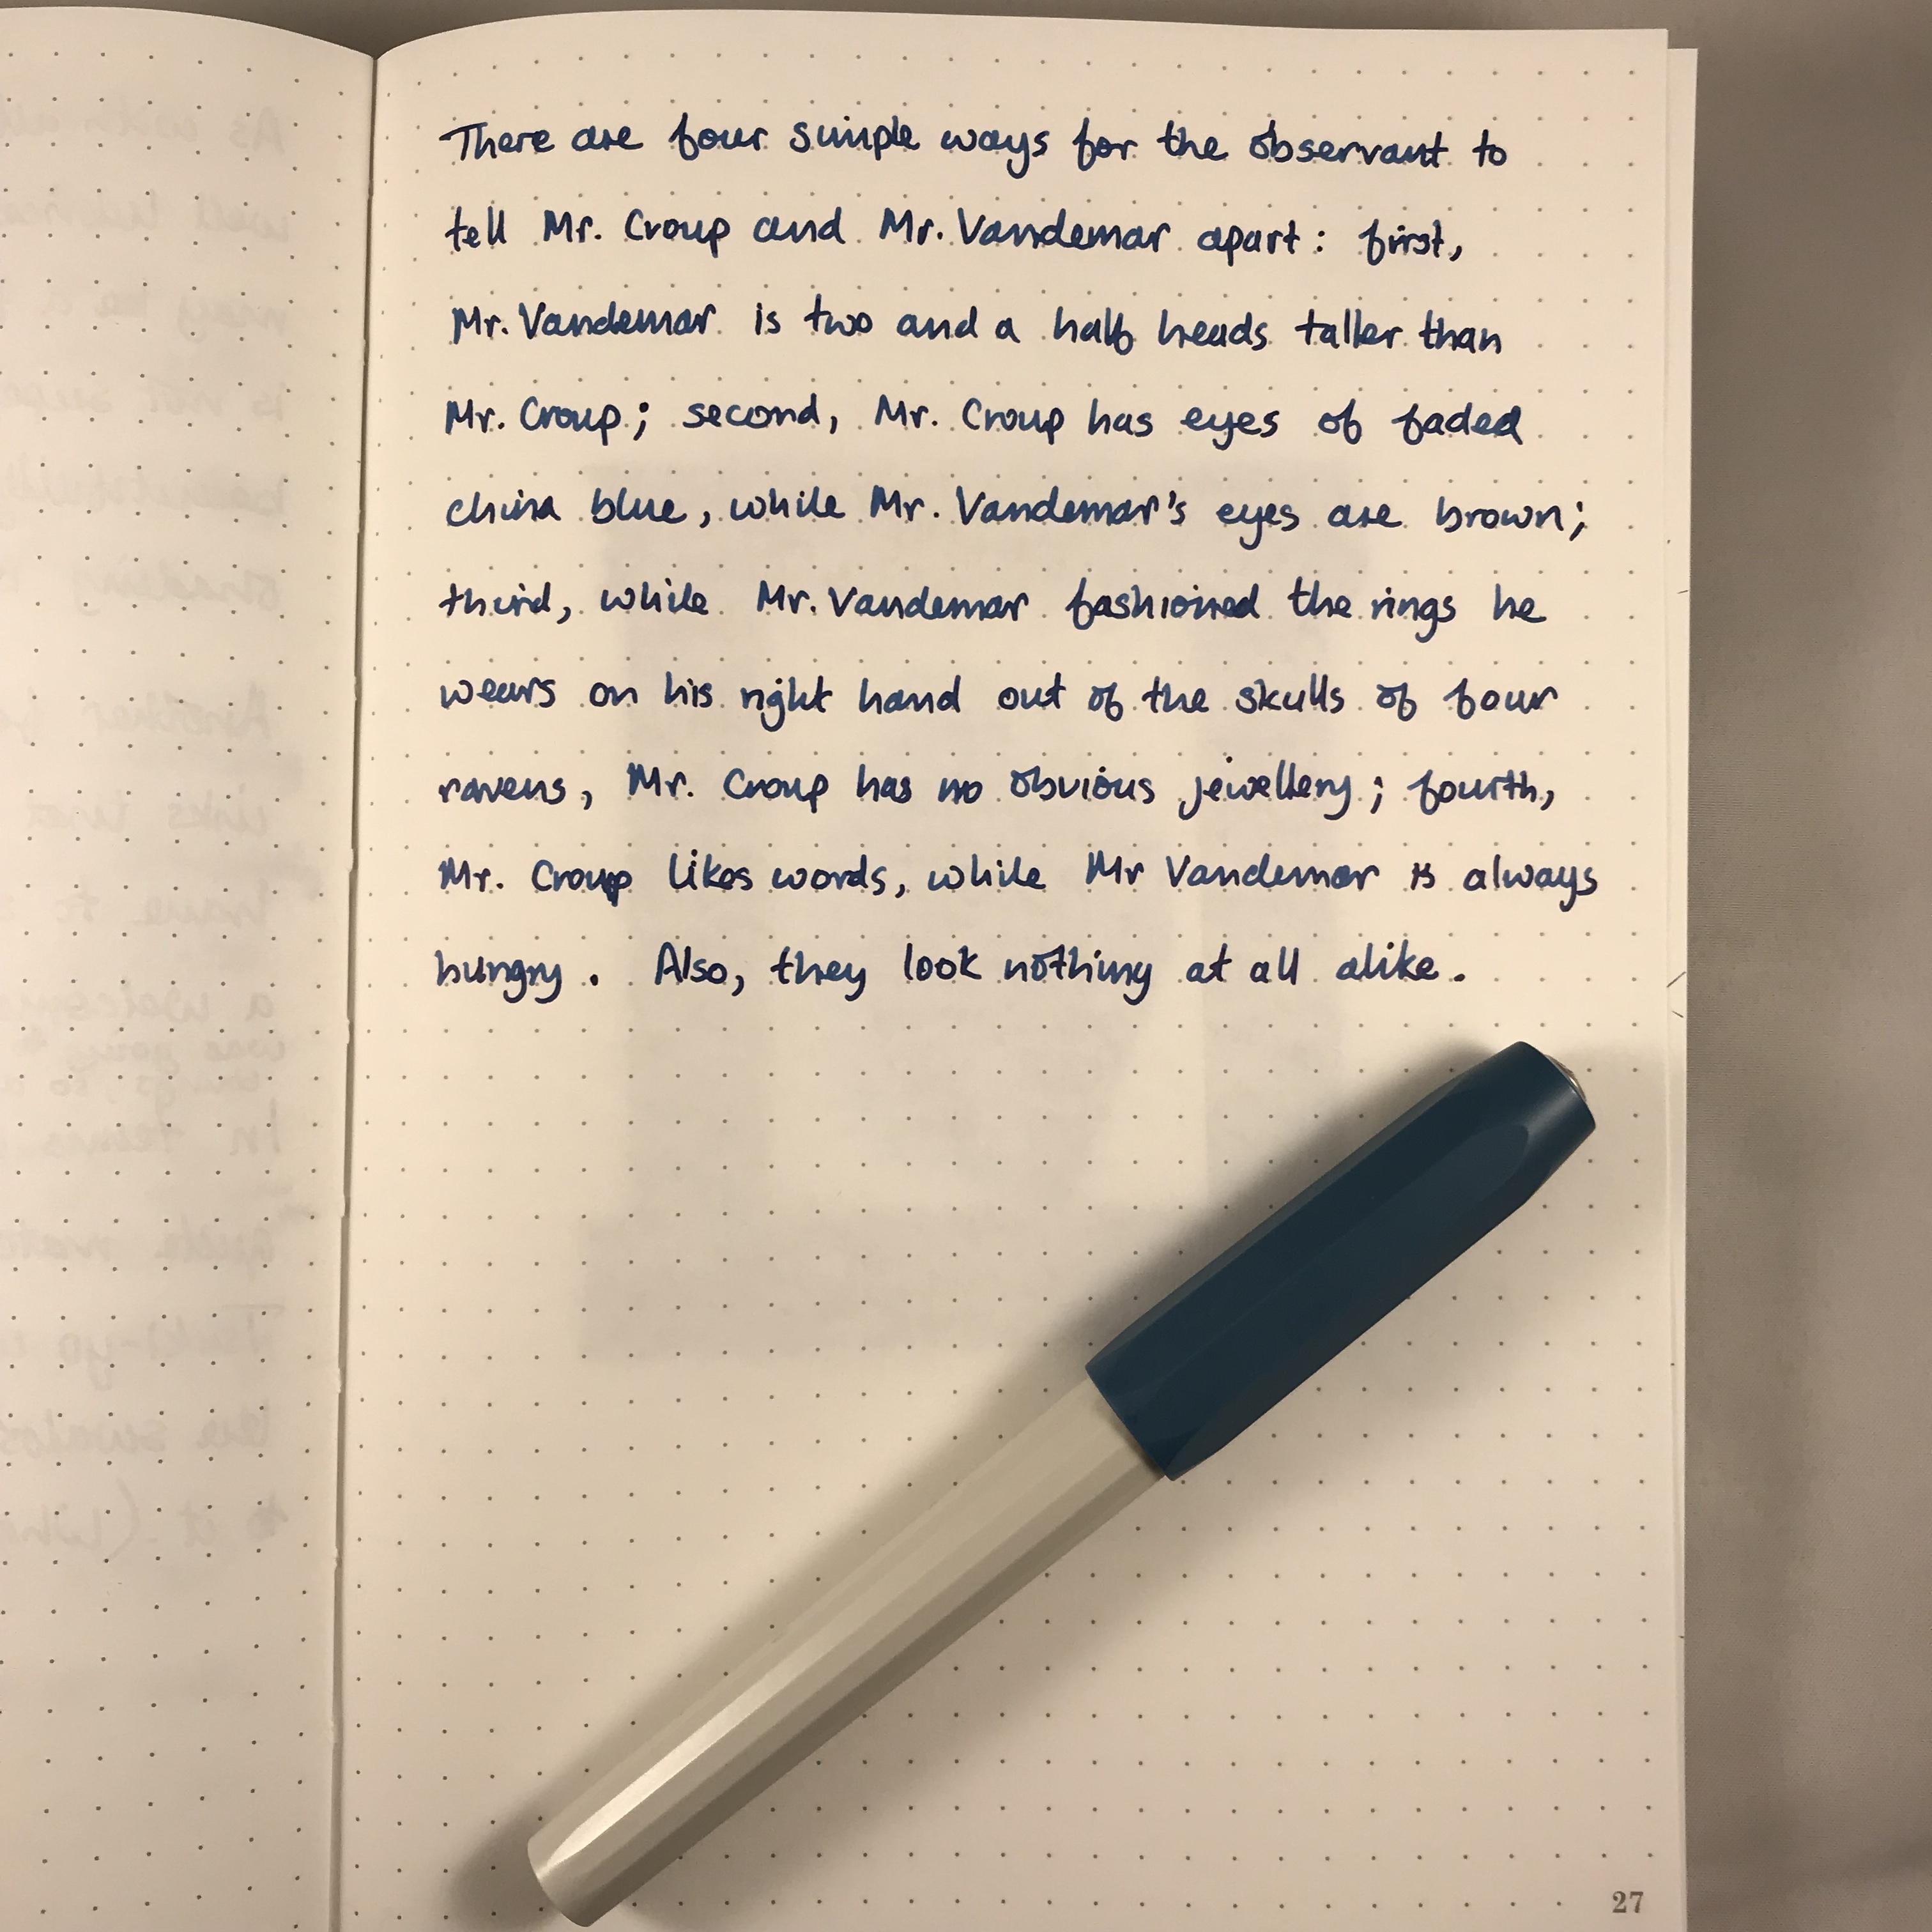 Writing sample, Kaweco Perkeo, medium nib, Sailor Sei-boku, Tomoe River